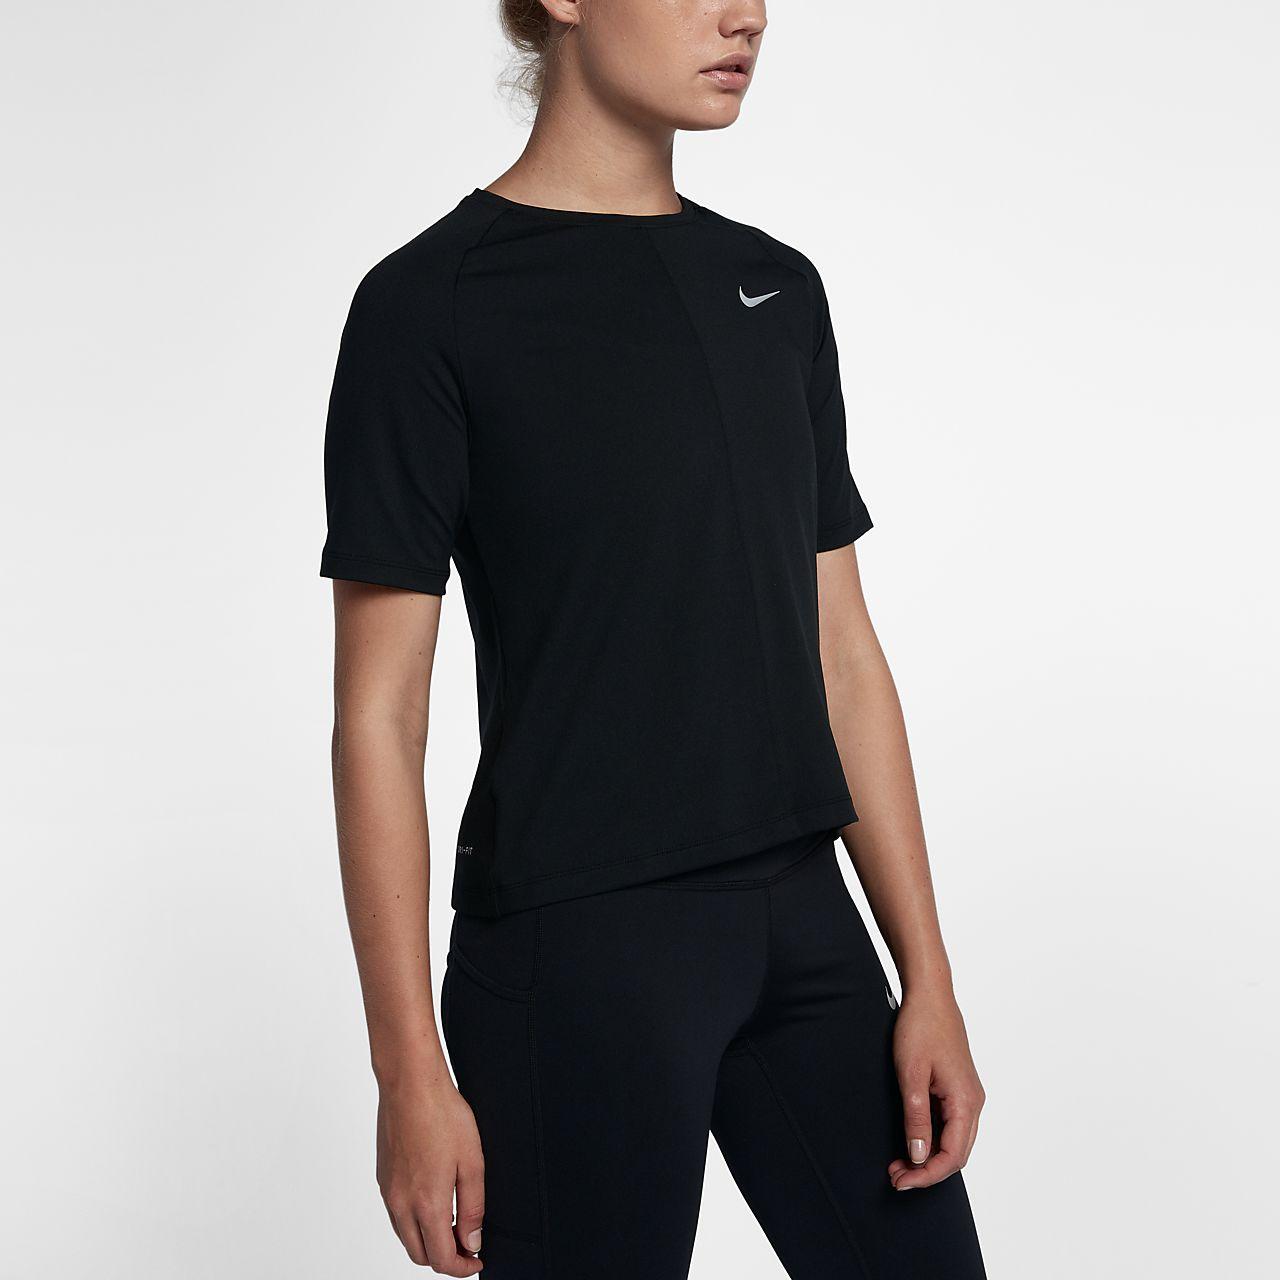 ... Nike Dri-FIT Element Women's Short-Sleeve Running Top